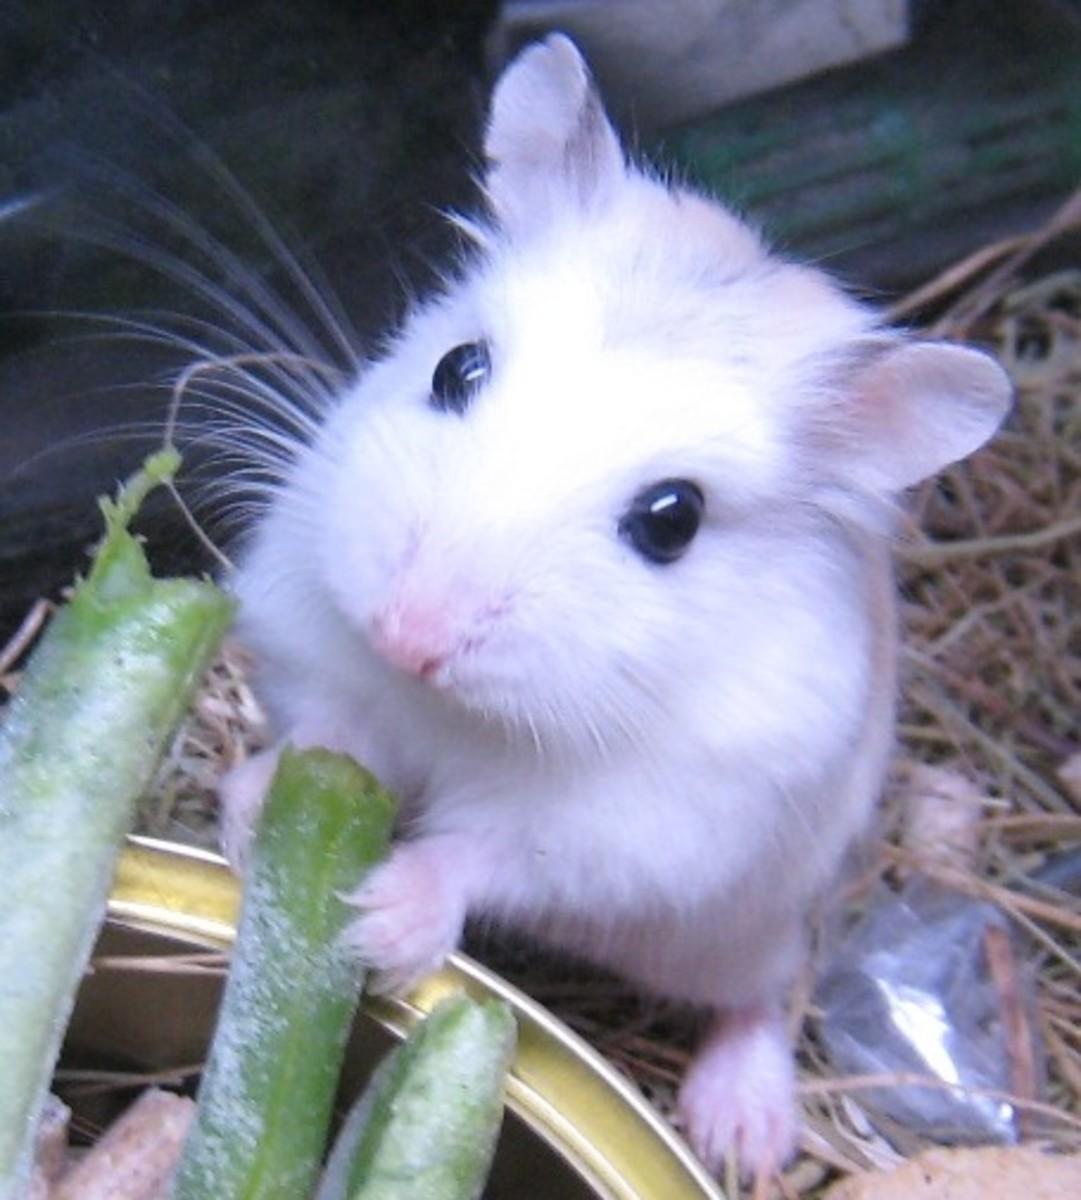 Here is a beautiful Dwarf Hamster enjoying a few green beans.